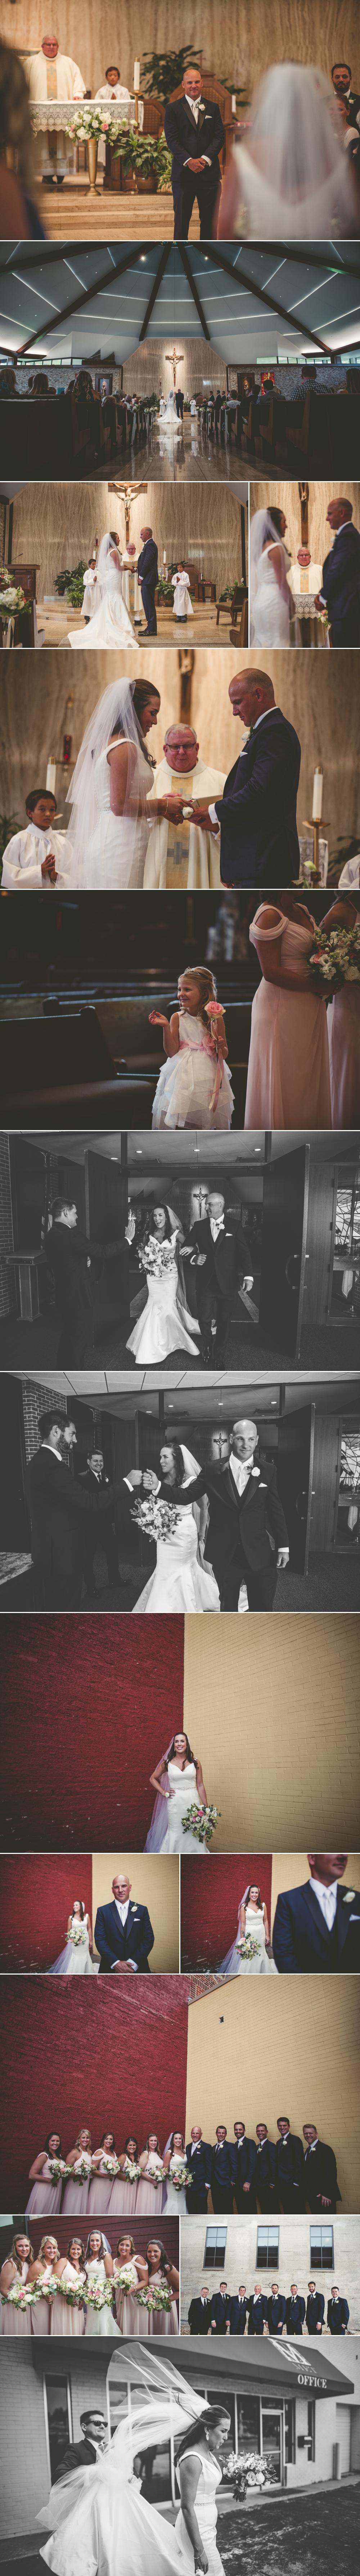 jason_domingues_photograhy_best_kansas_city_wedding_photographer_kc_weddings_scarritt_building_cure_of_ars_0002.JPG